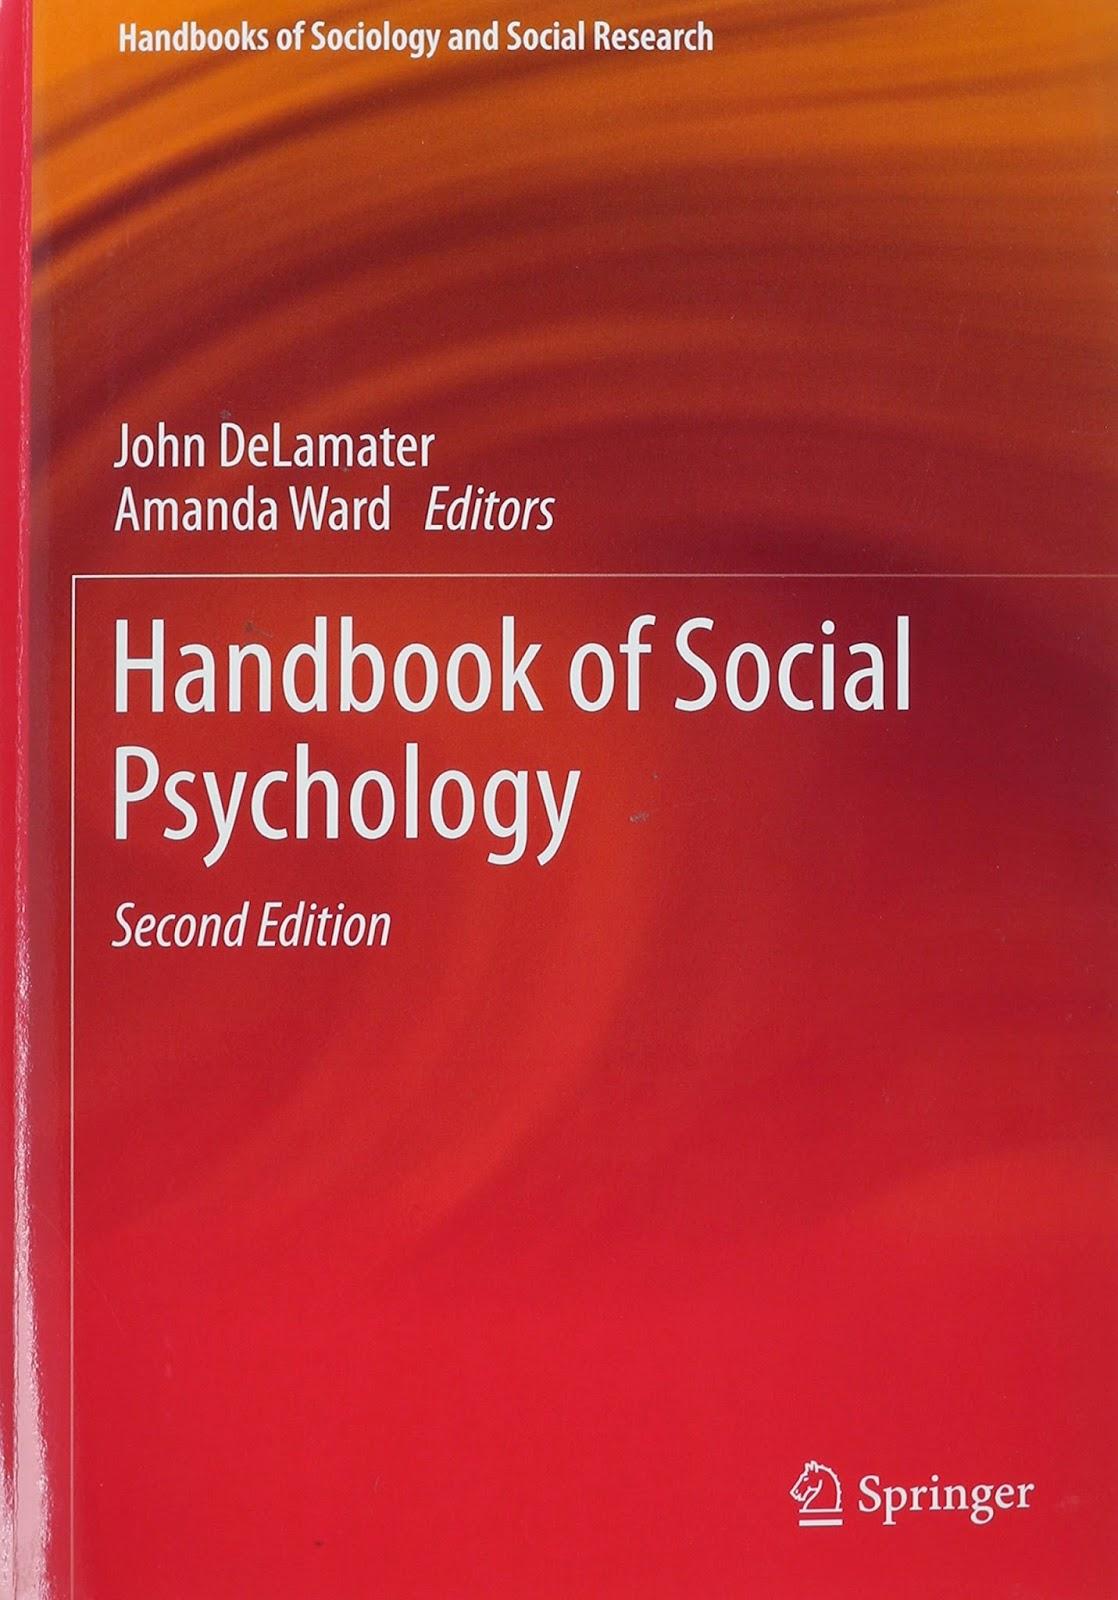 http://www.kingcheapebooks.com/2014/10/handbook-of-social-psychology.html